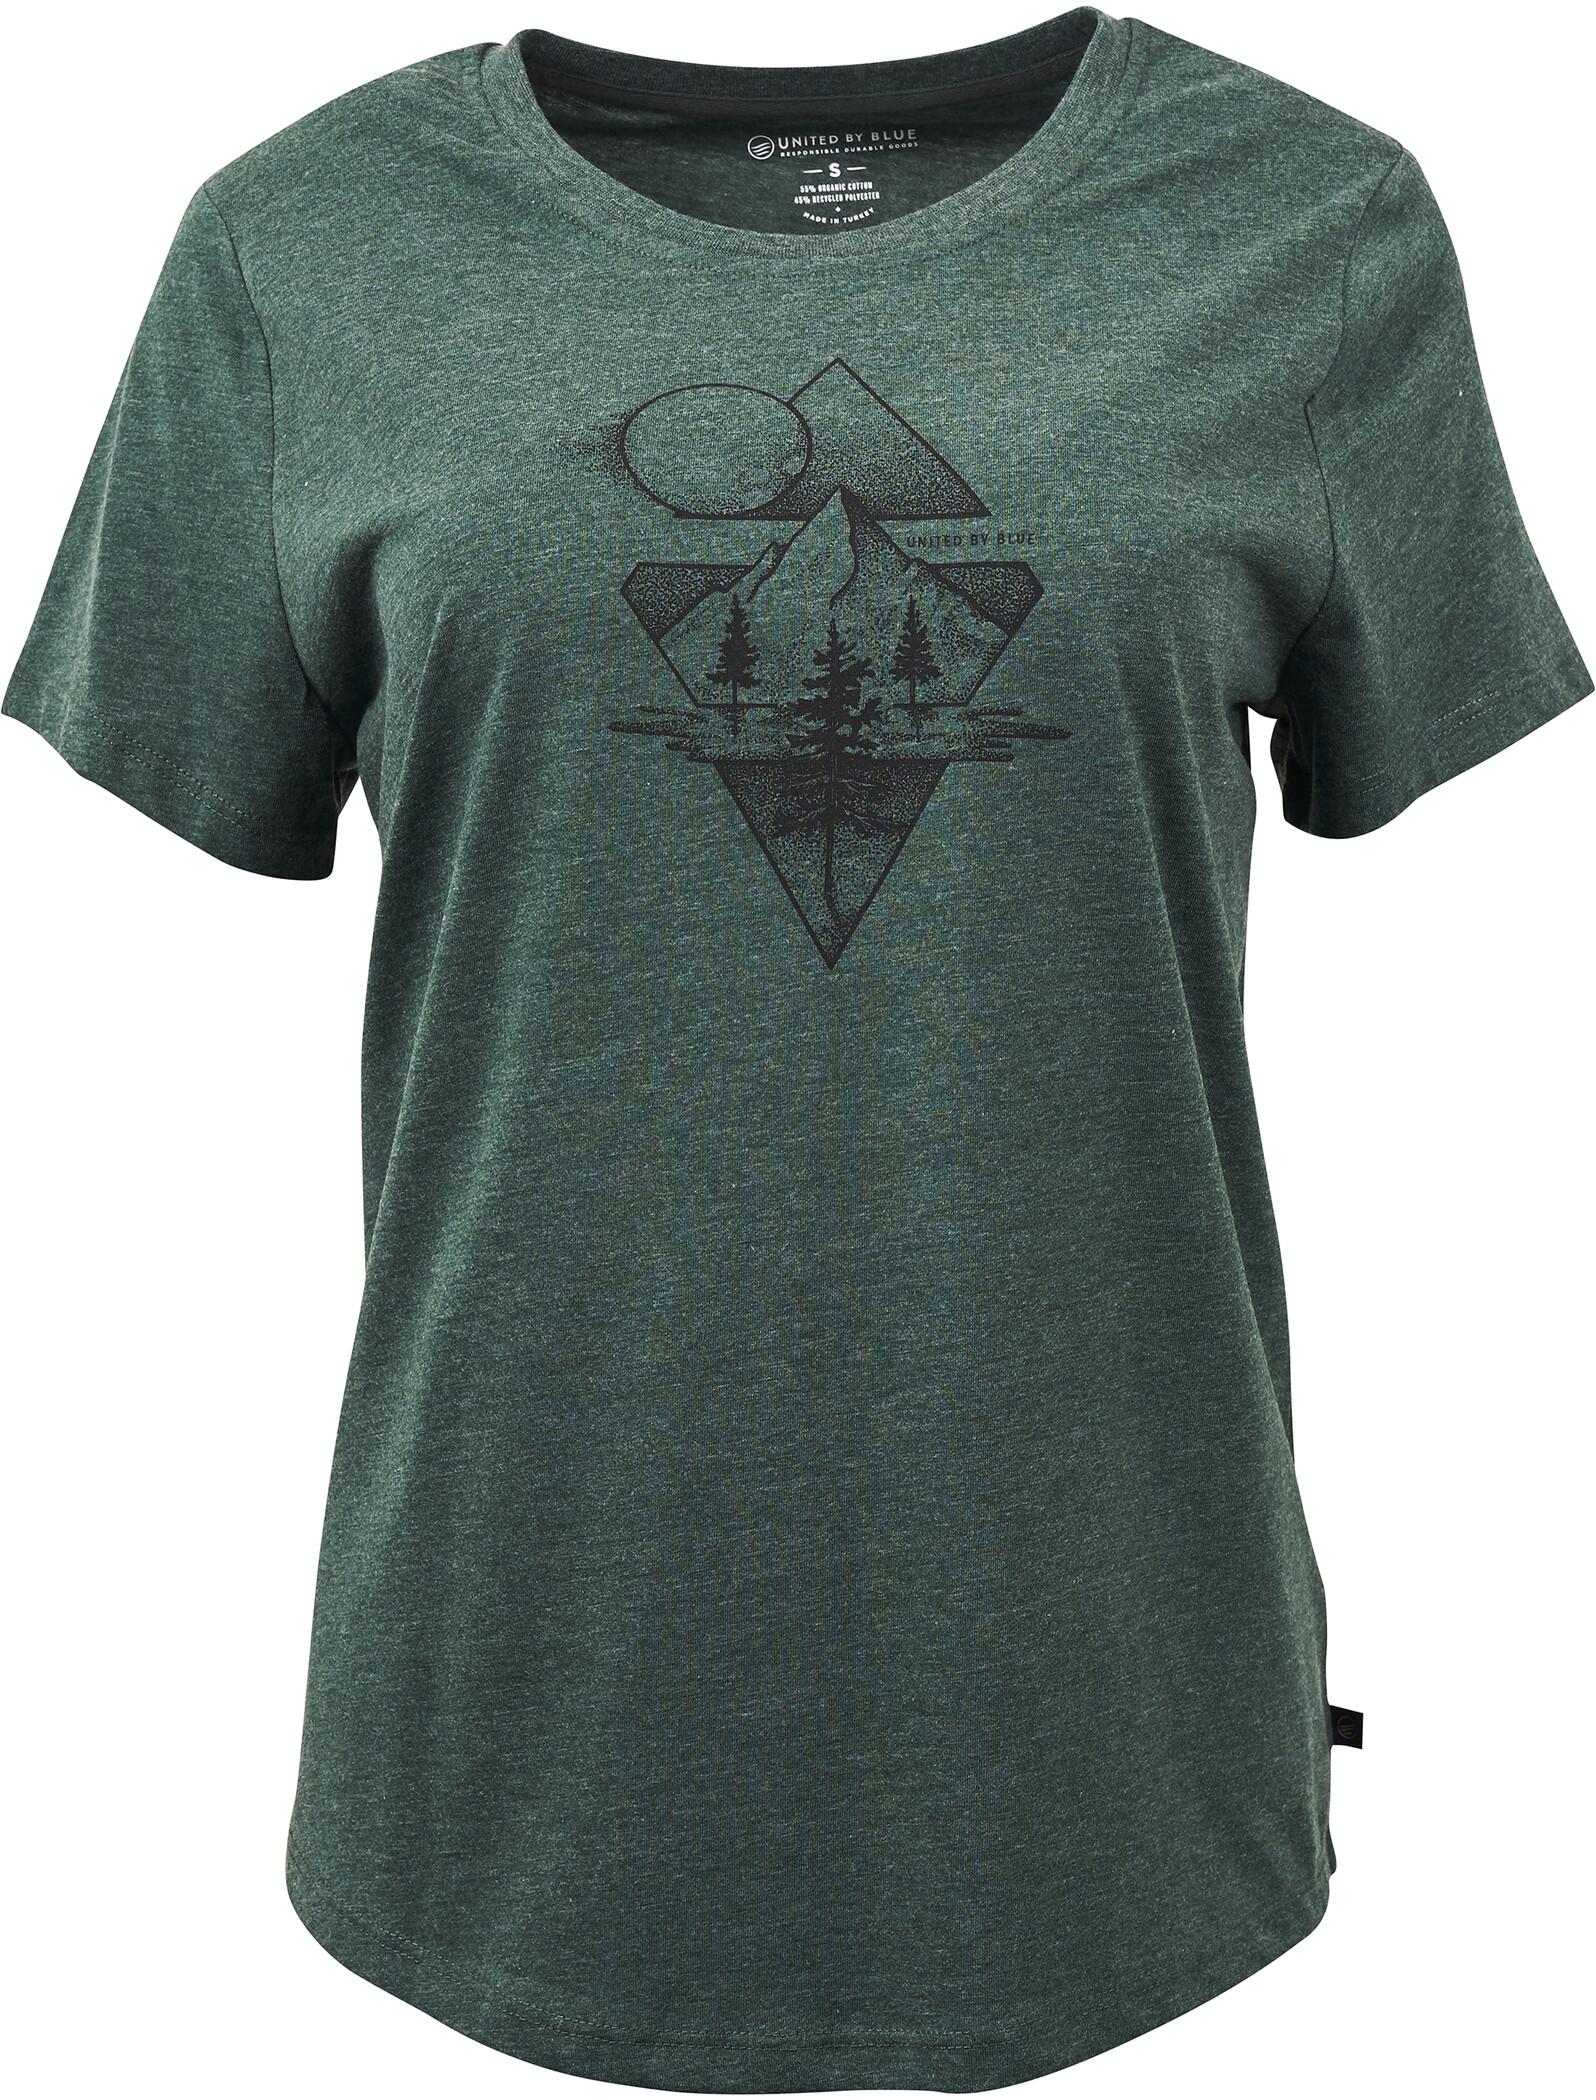 XYMYFC-E Pitbull Heart Adult Womens Long-Sleeved Tshirt